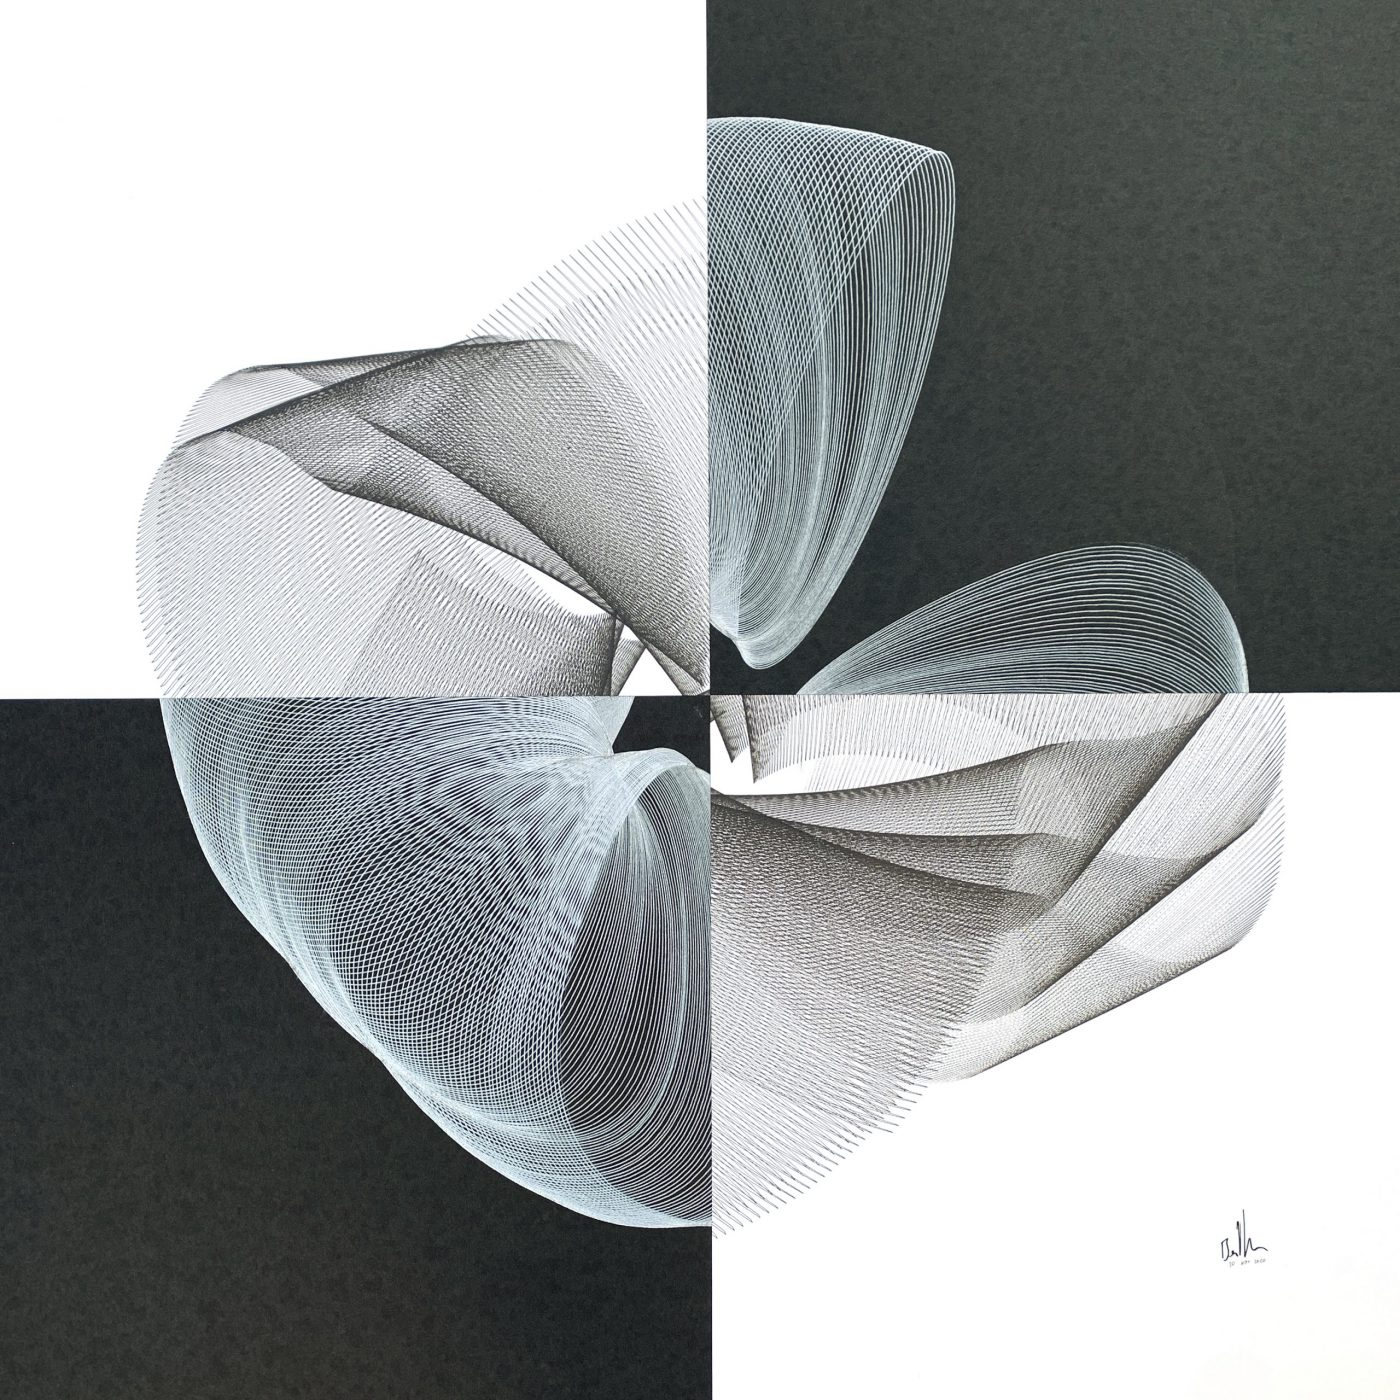 x335 - 30 Nov